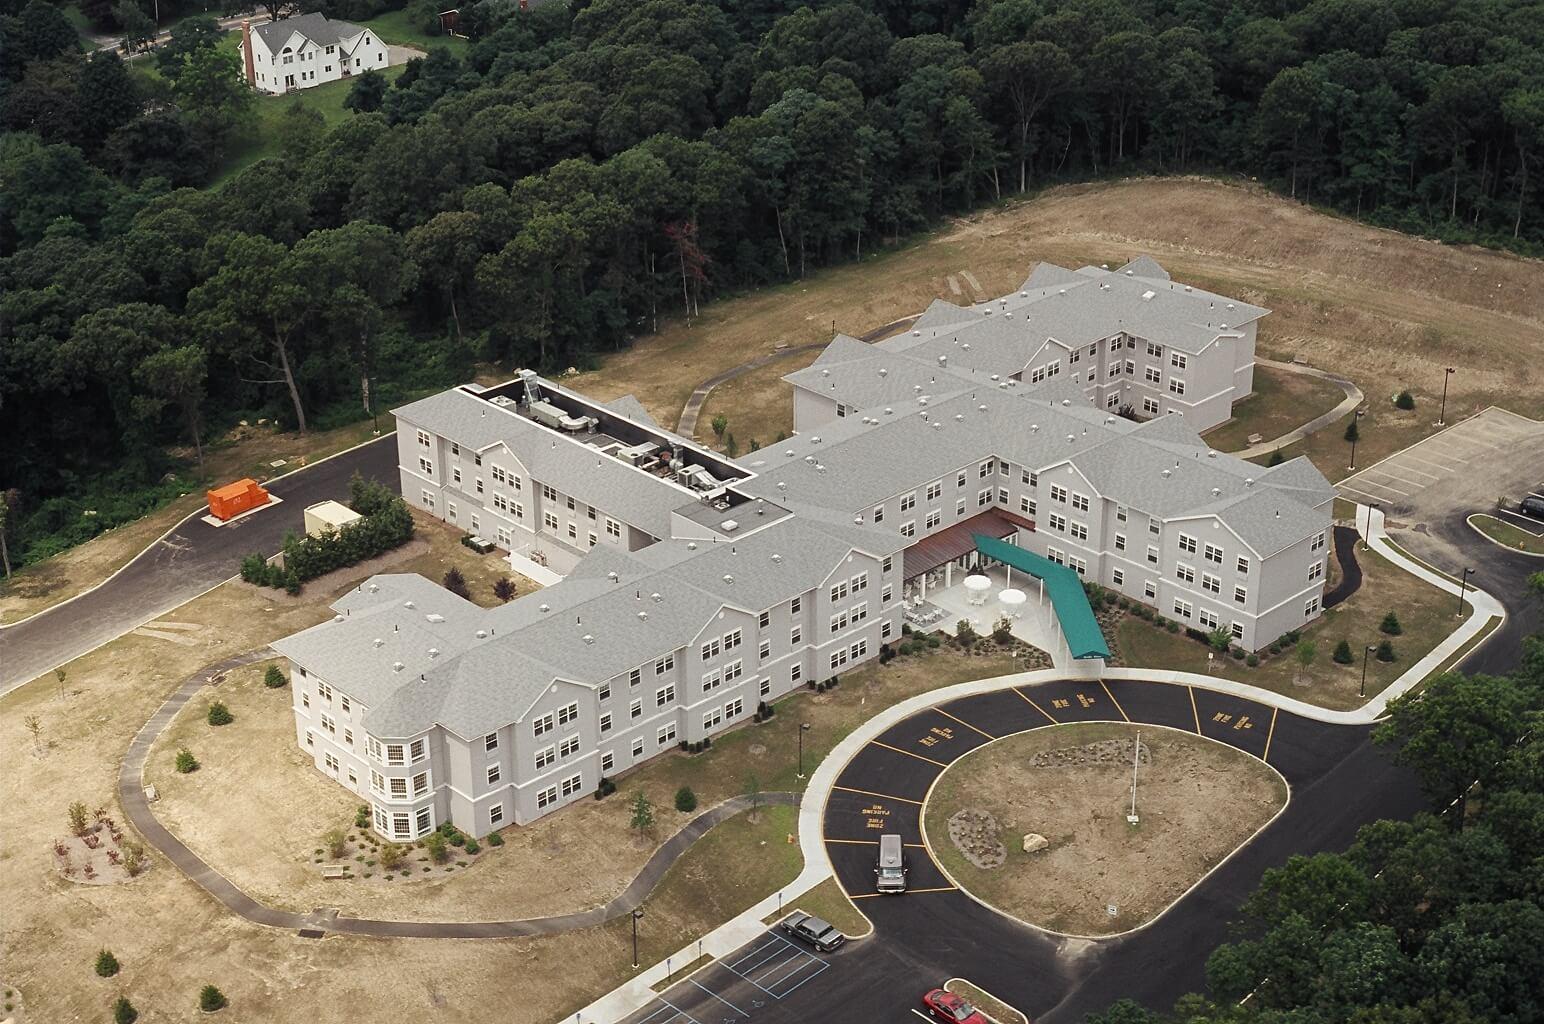 Petrocelli house building